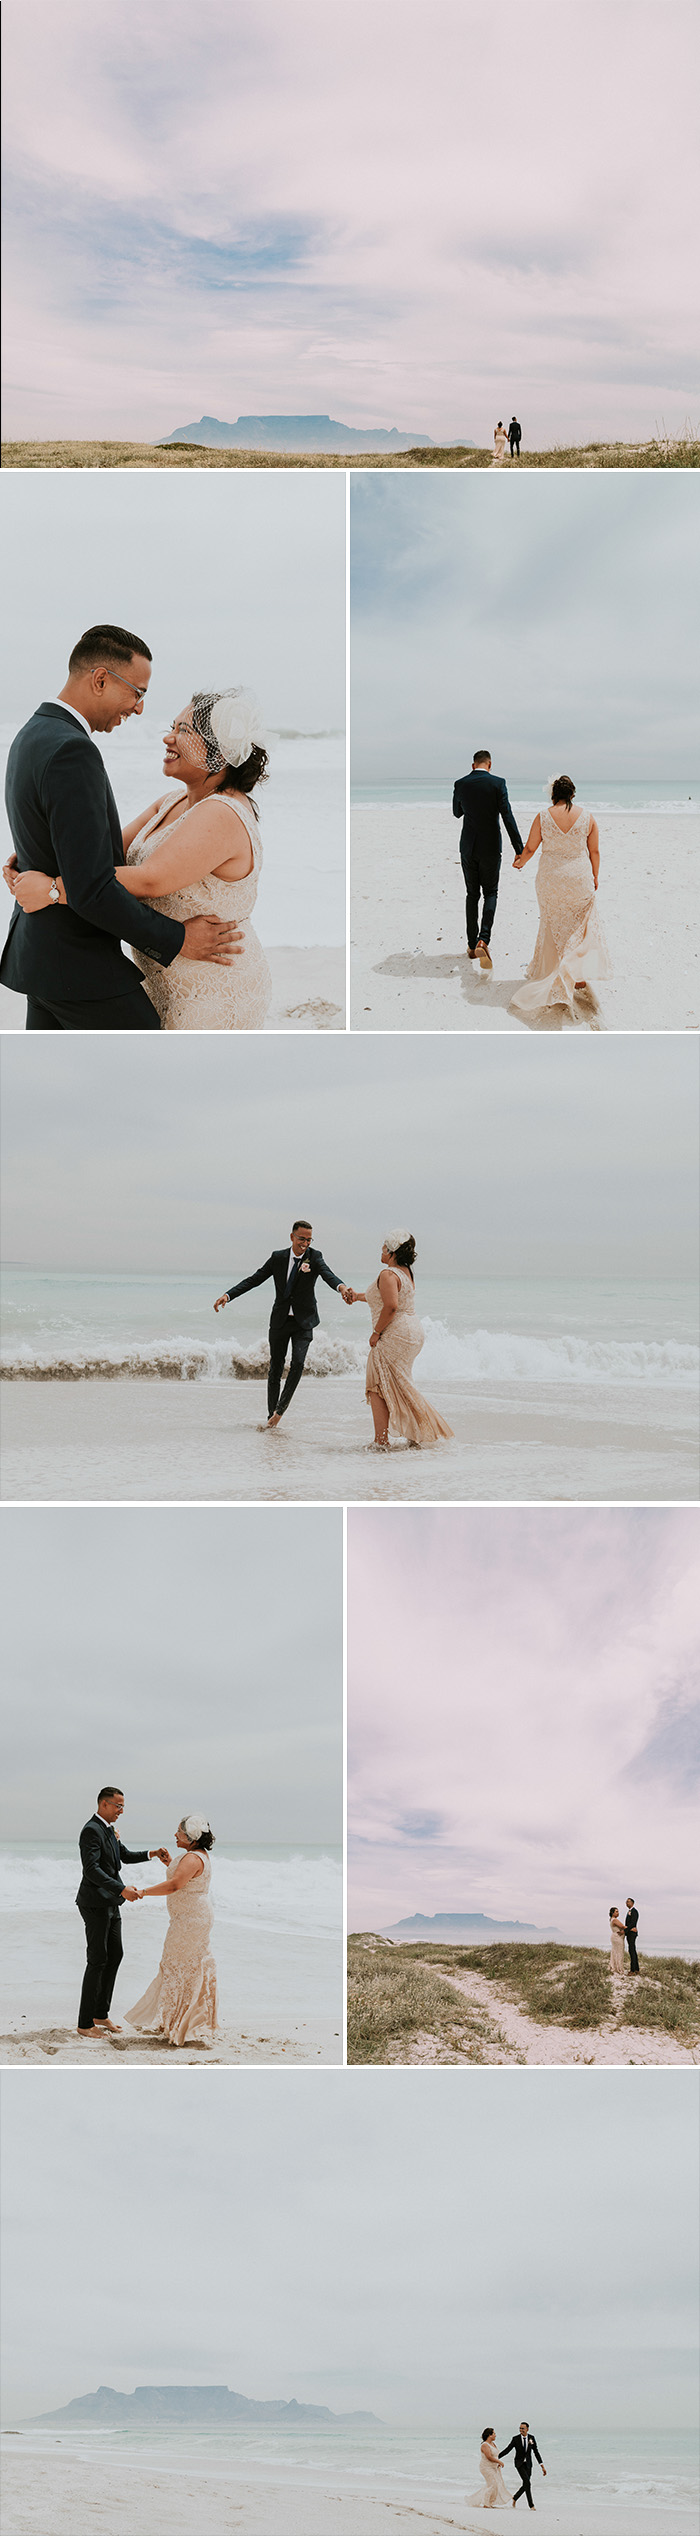 cape town wedding photography.jpg